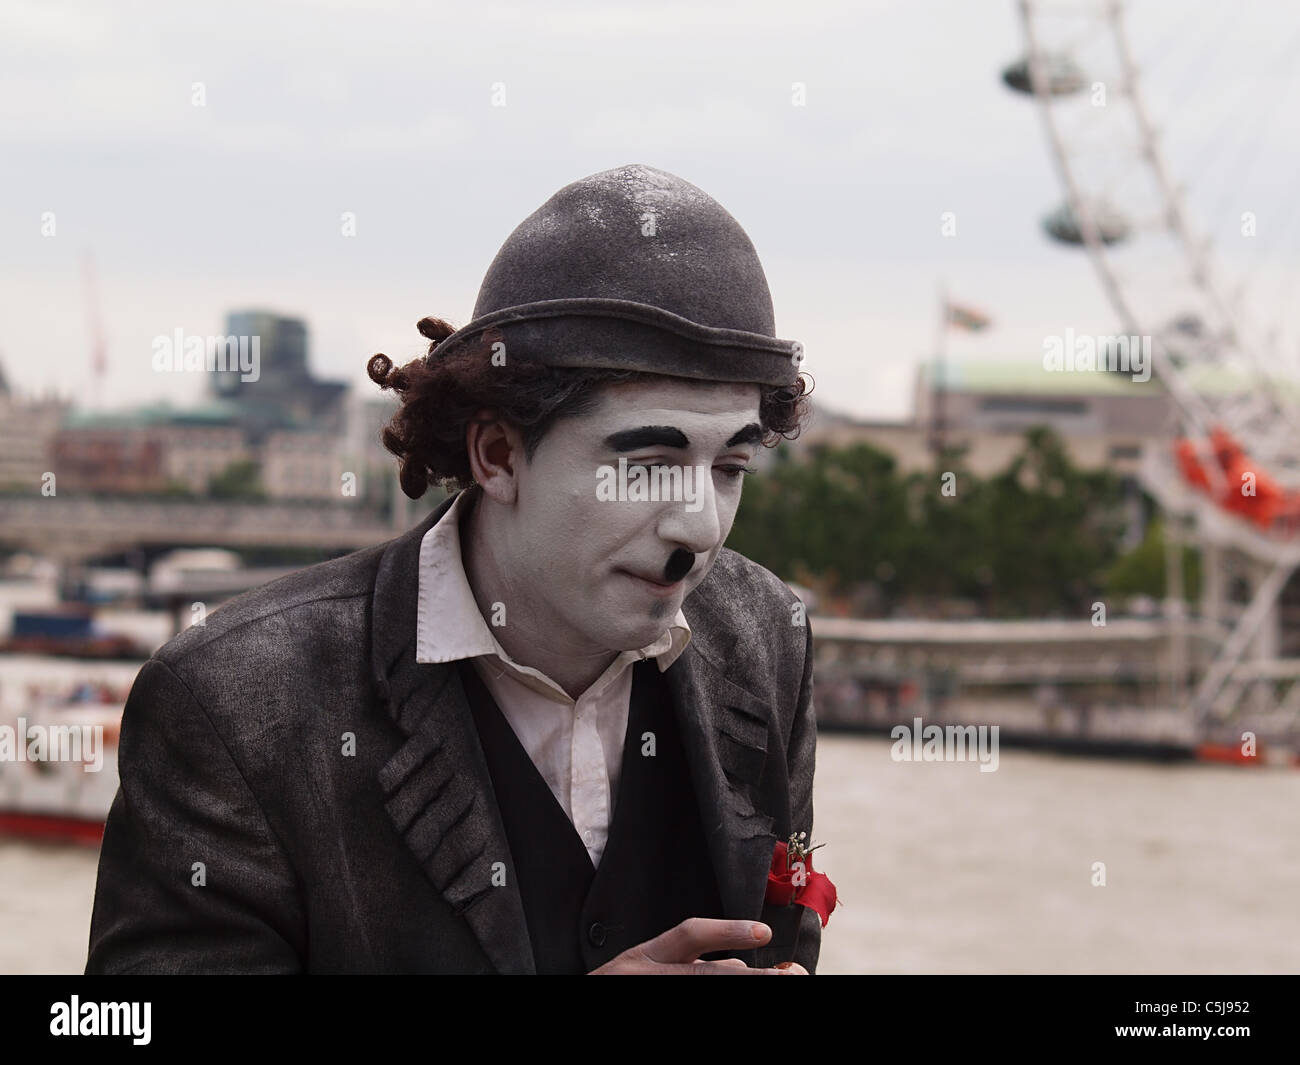 Mime artist busking on Westminster Bridge, London Stock Photo